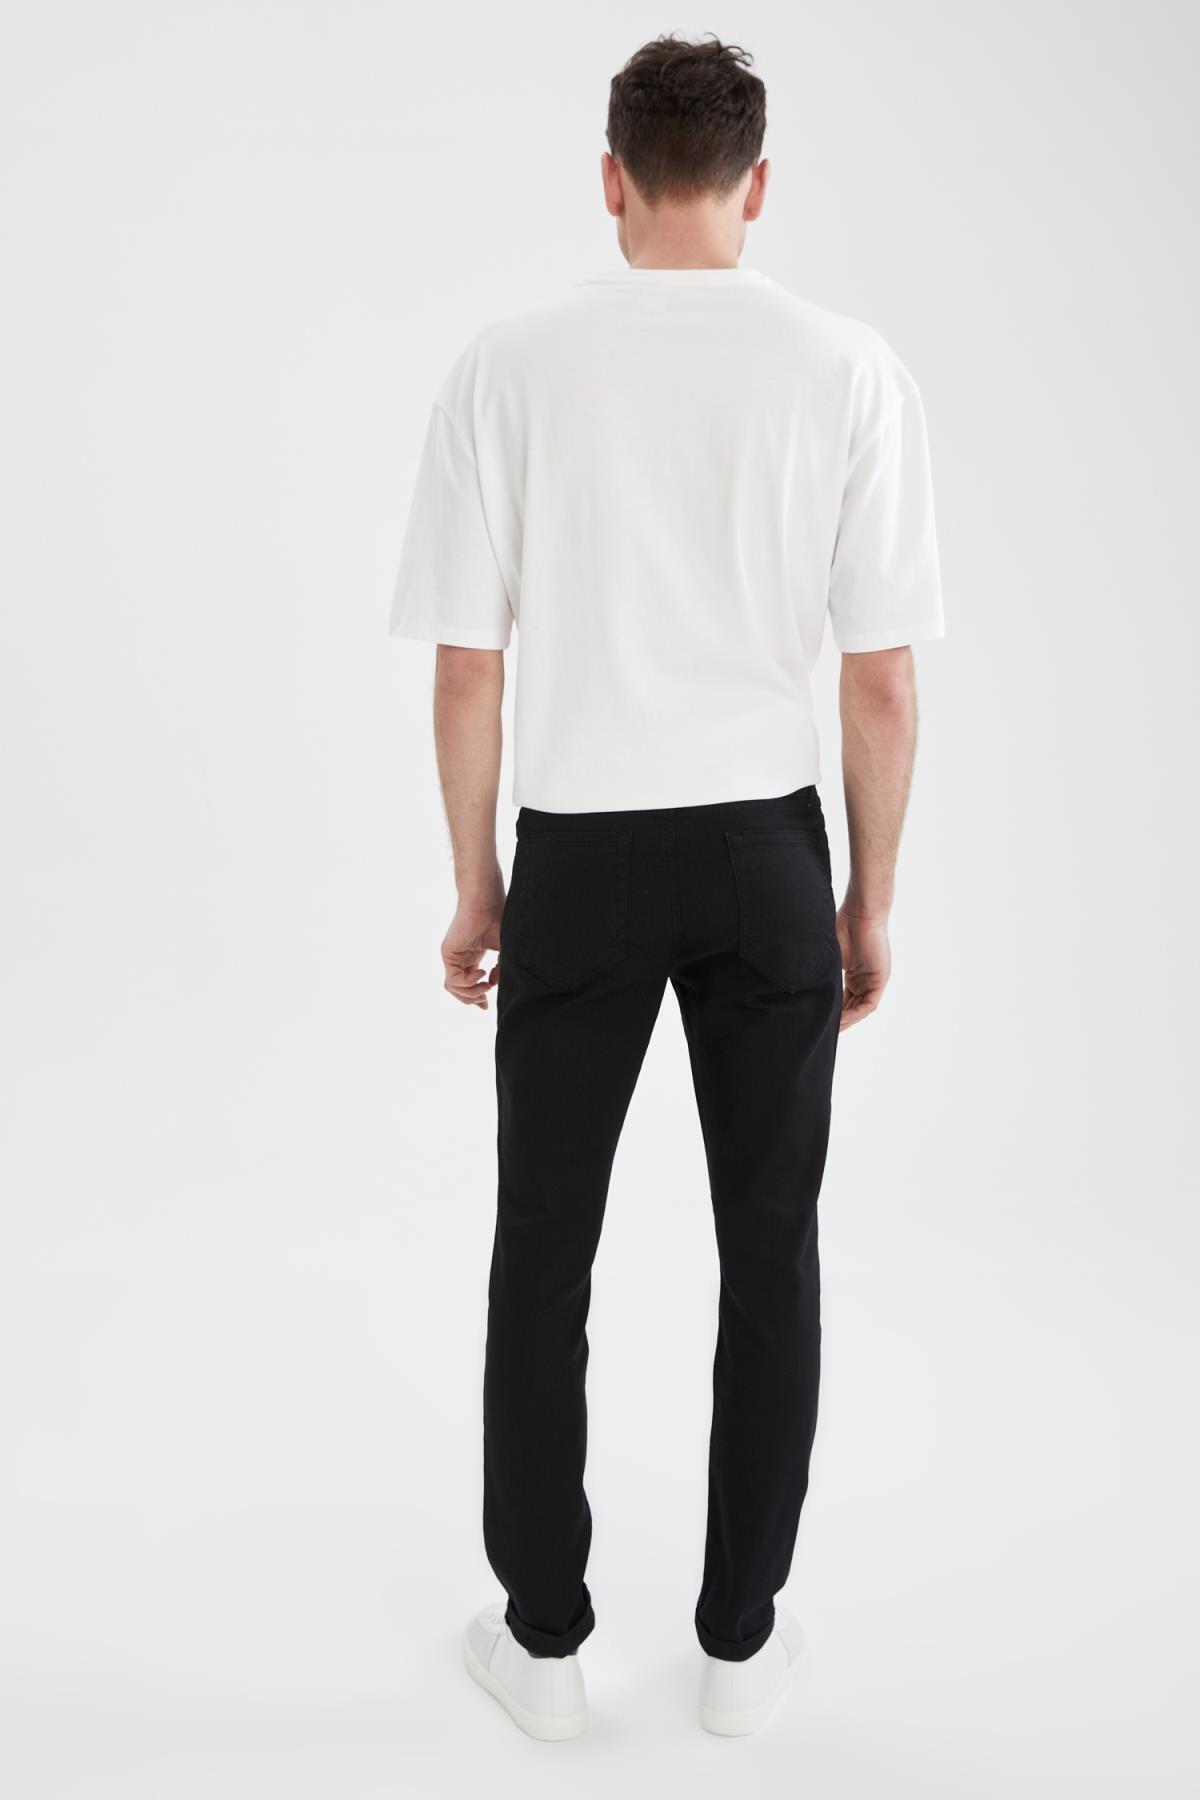 Defacto Carlo Skinny Fit Düşük Bel Dar Paça Siyah Jean Pantolon